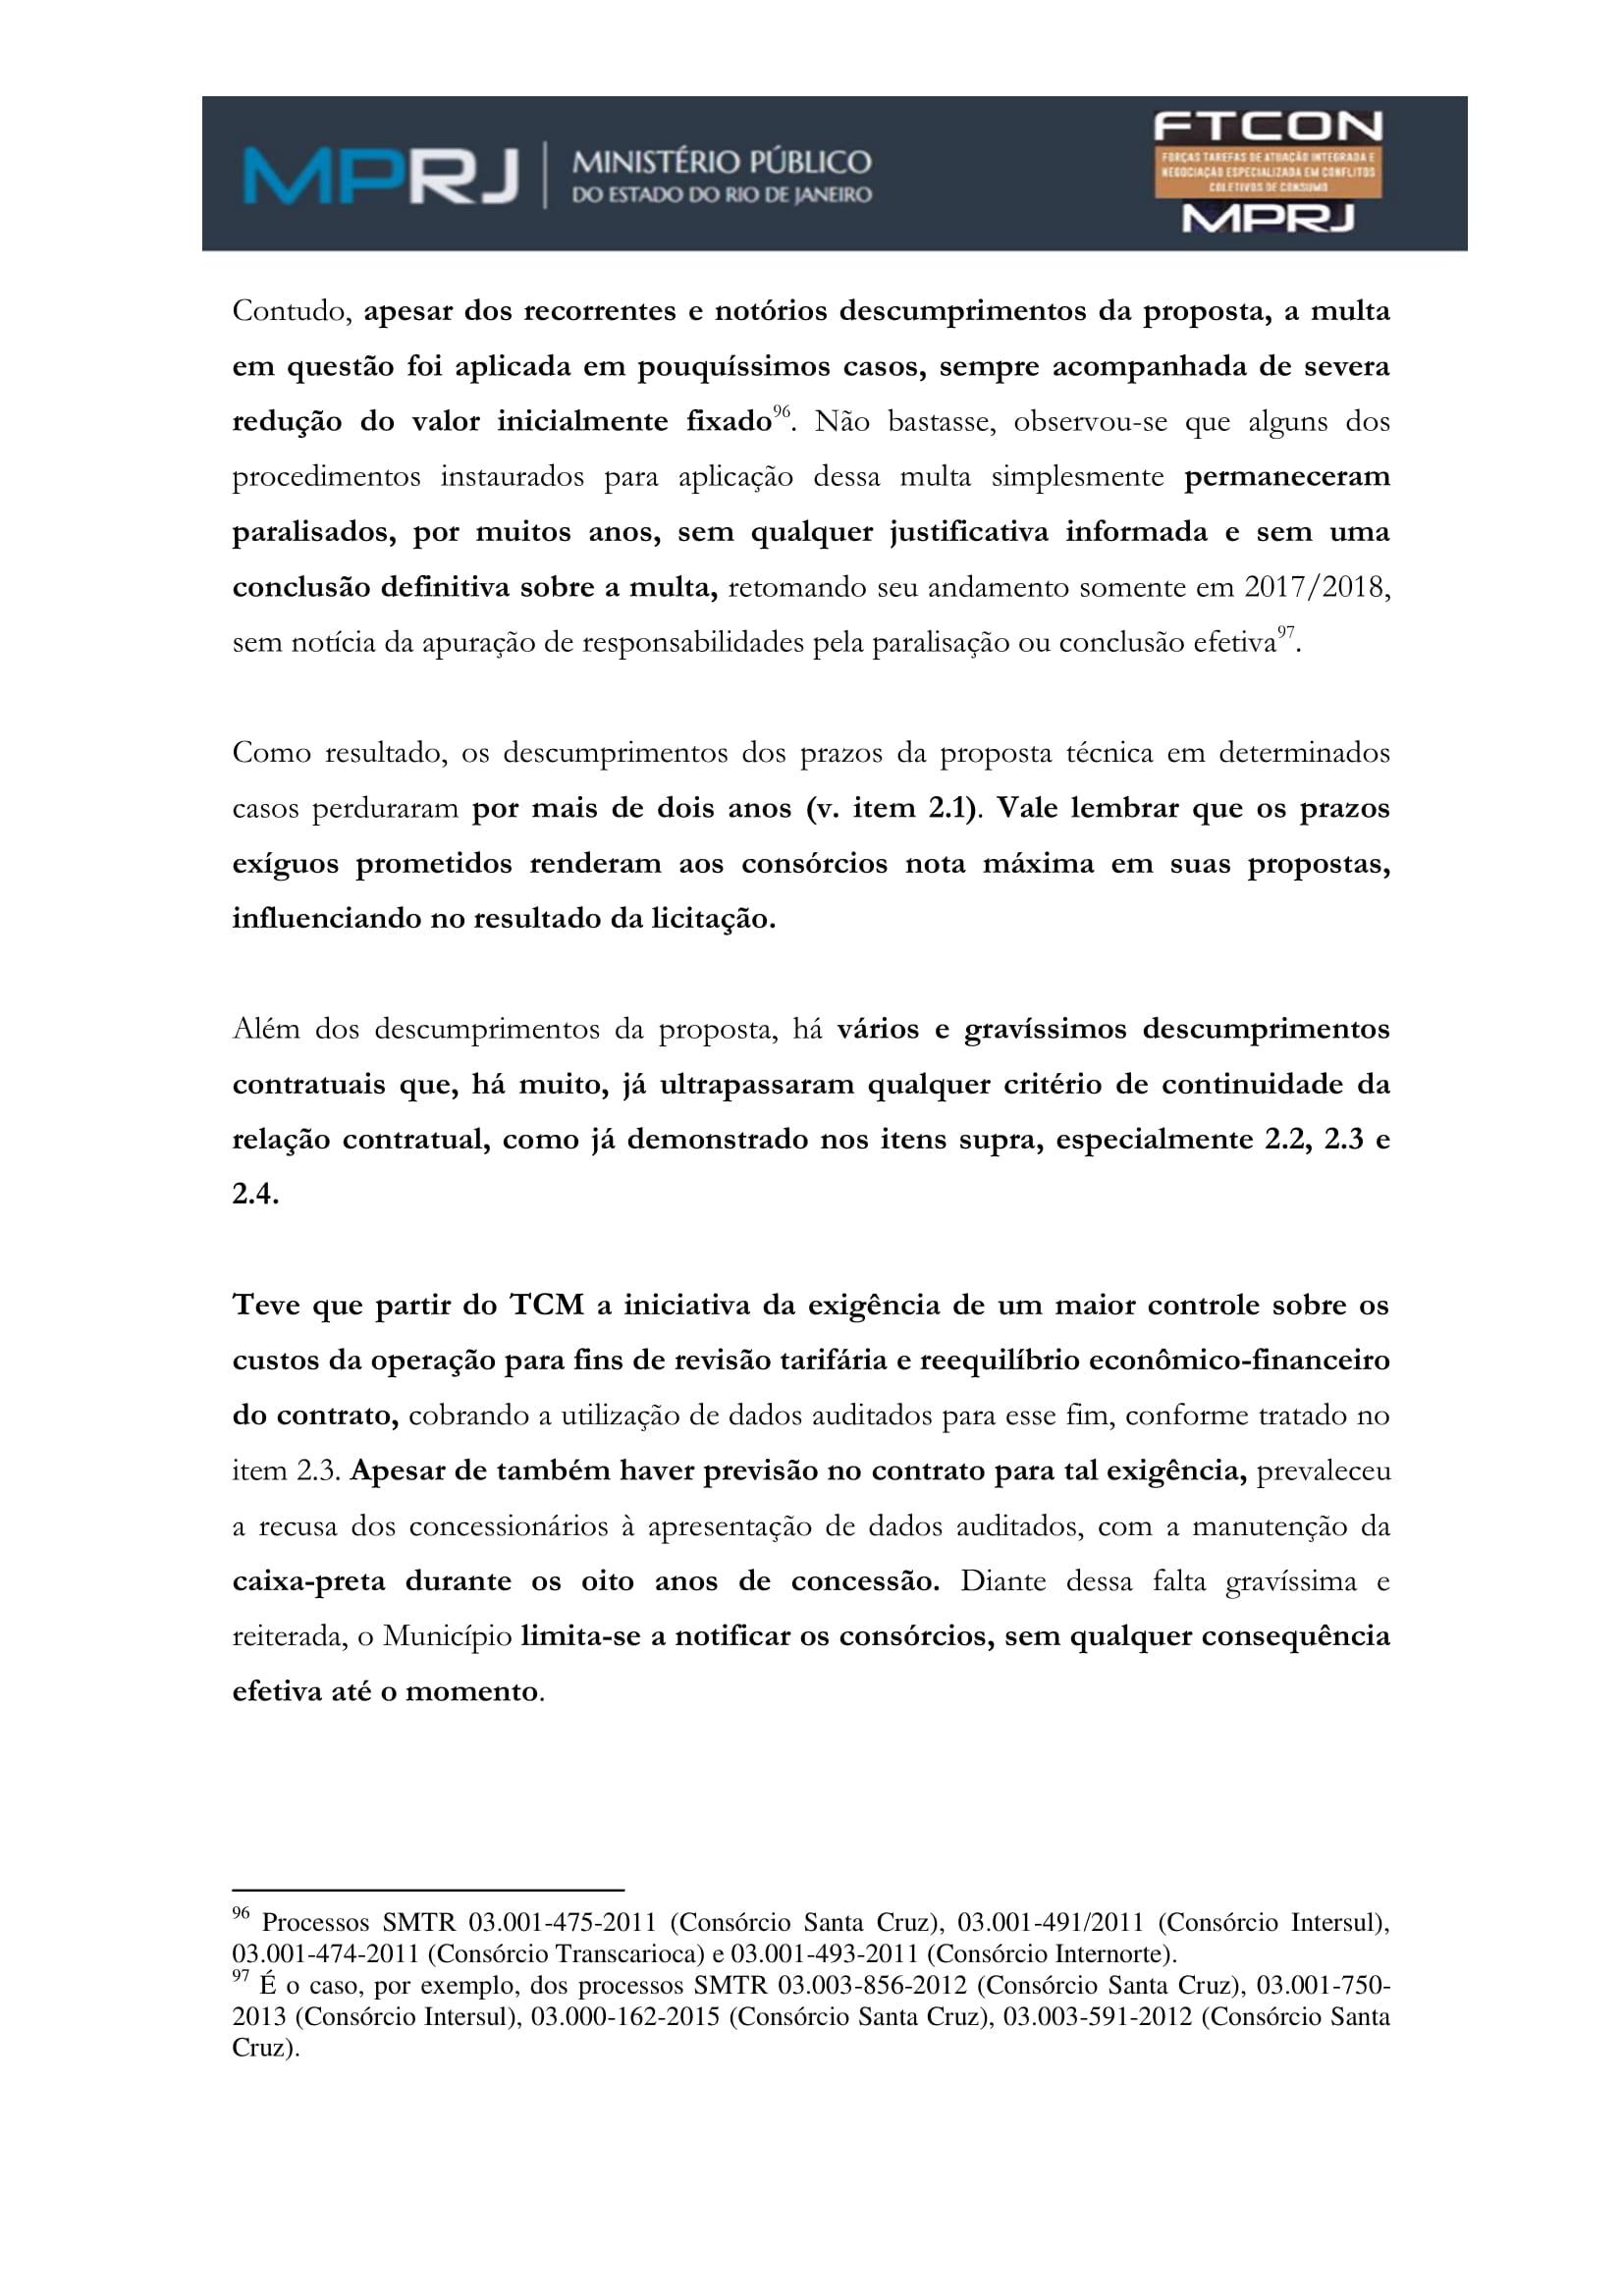 acp_caducidade_onibus_dr_rt-107